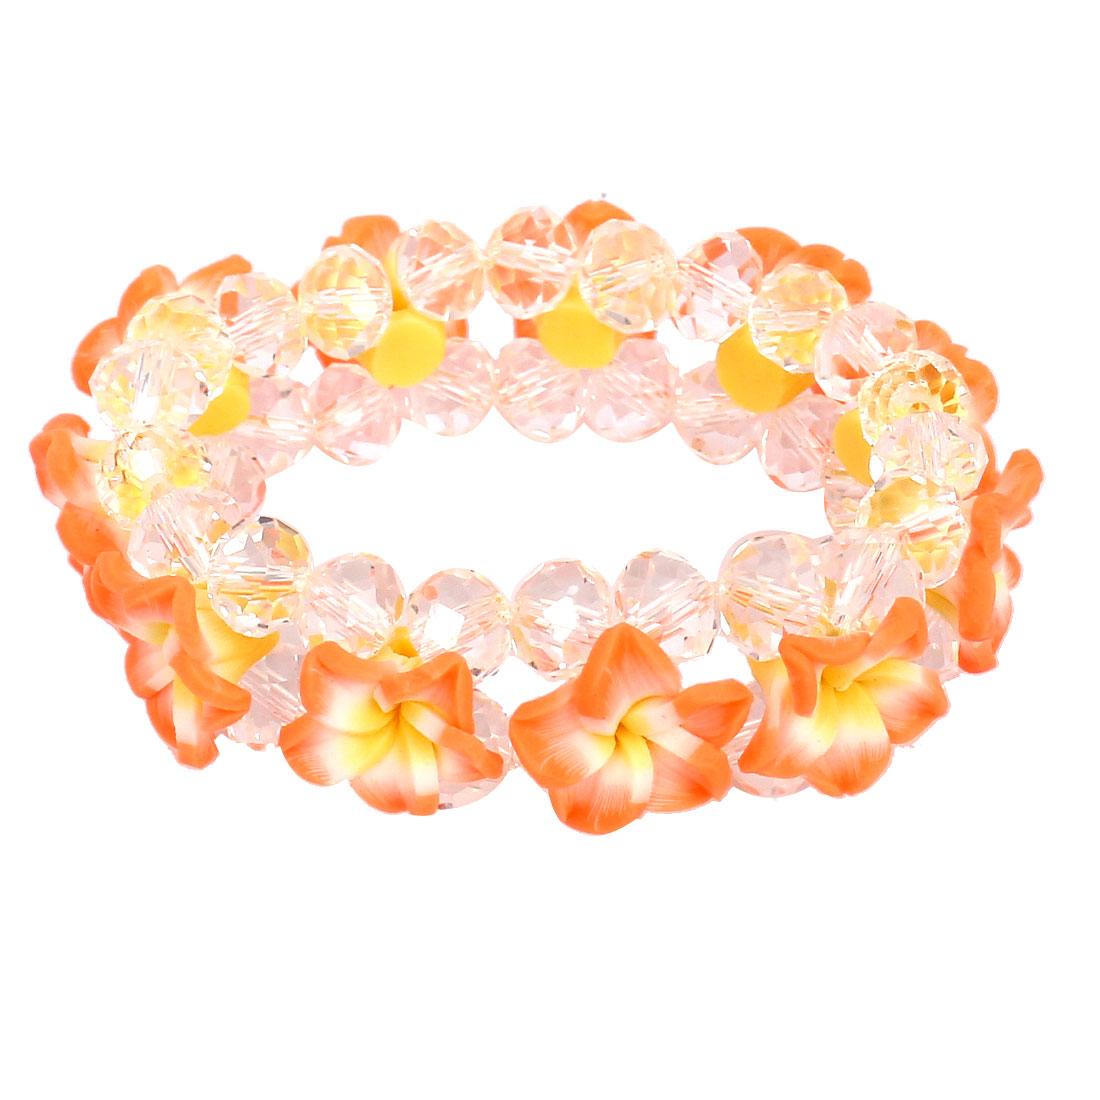 Lady Peony Flower Faux Crystal Inlaid Wrist Chain Bracelet Ornament Orange